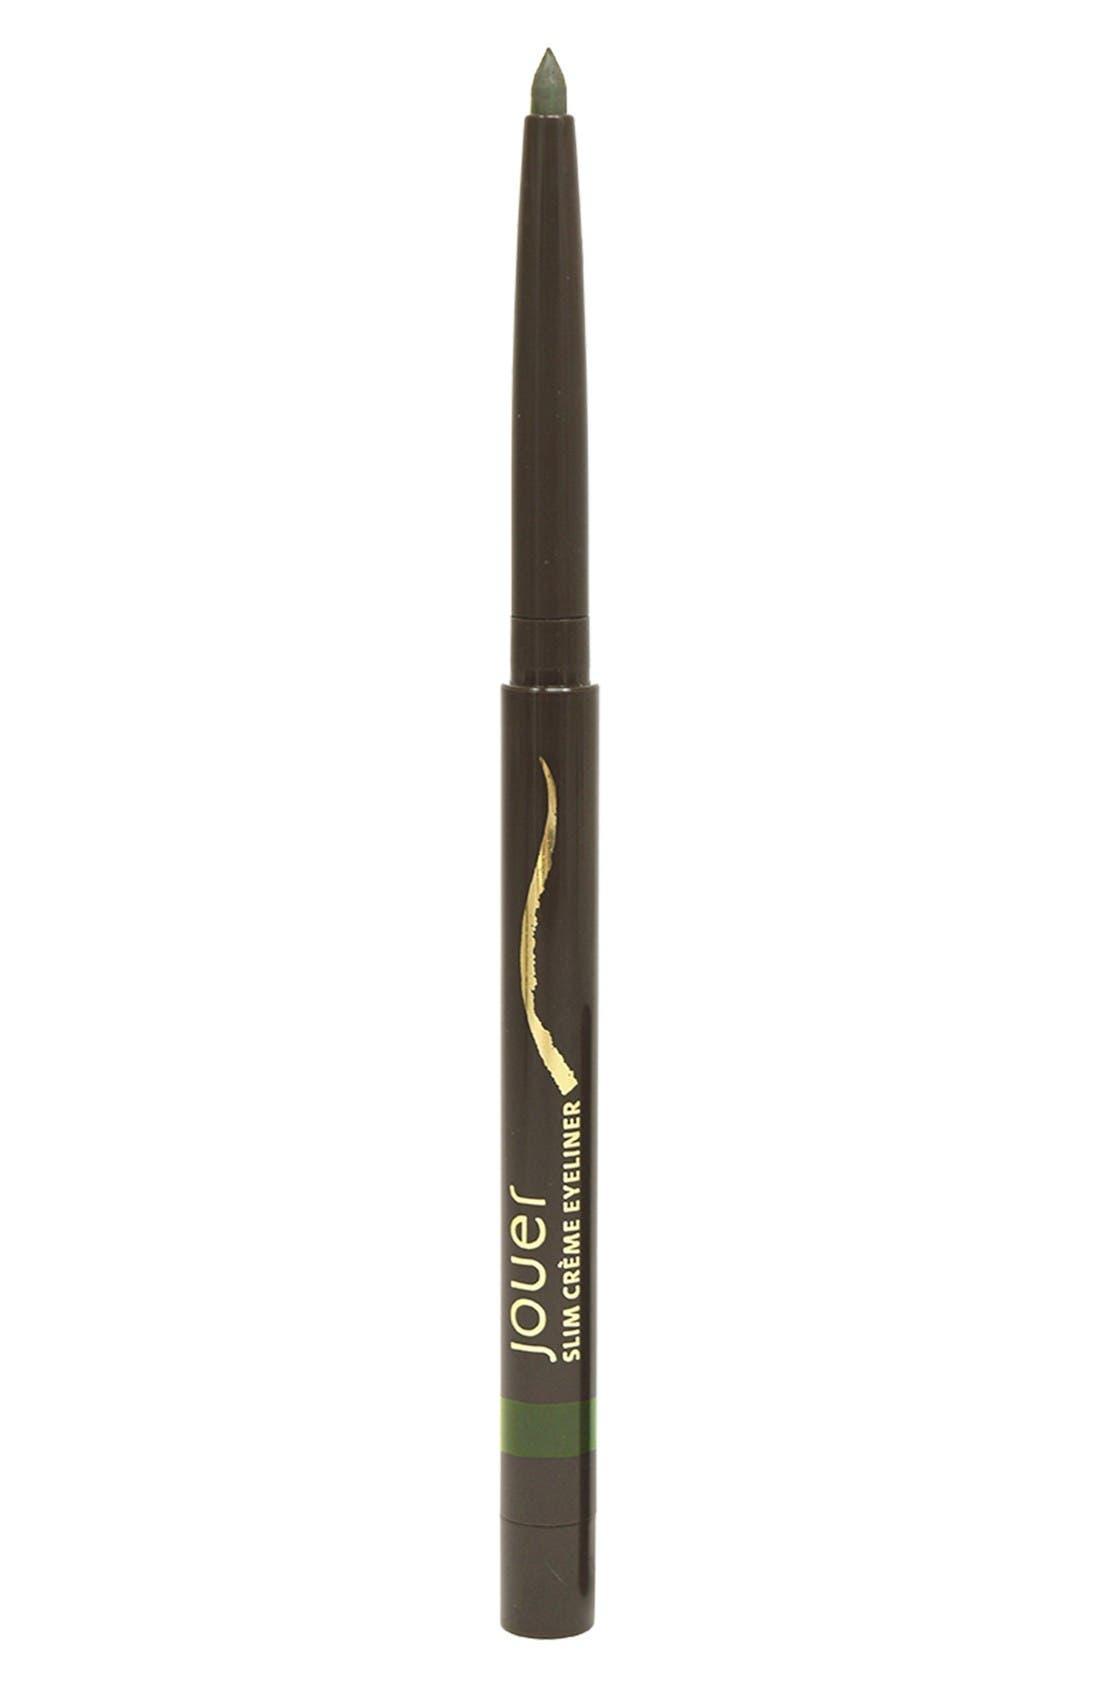 Jouer Slim Crème Eyeliner